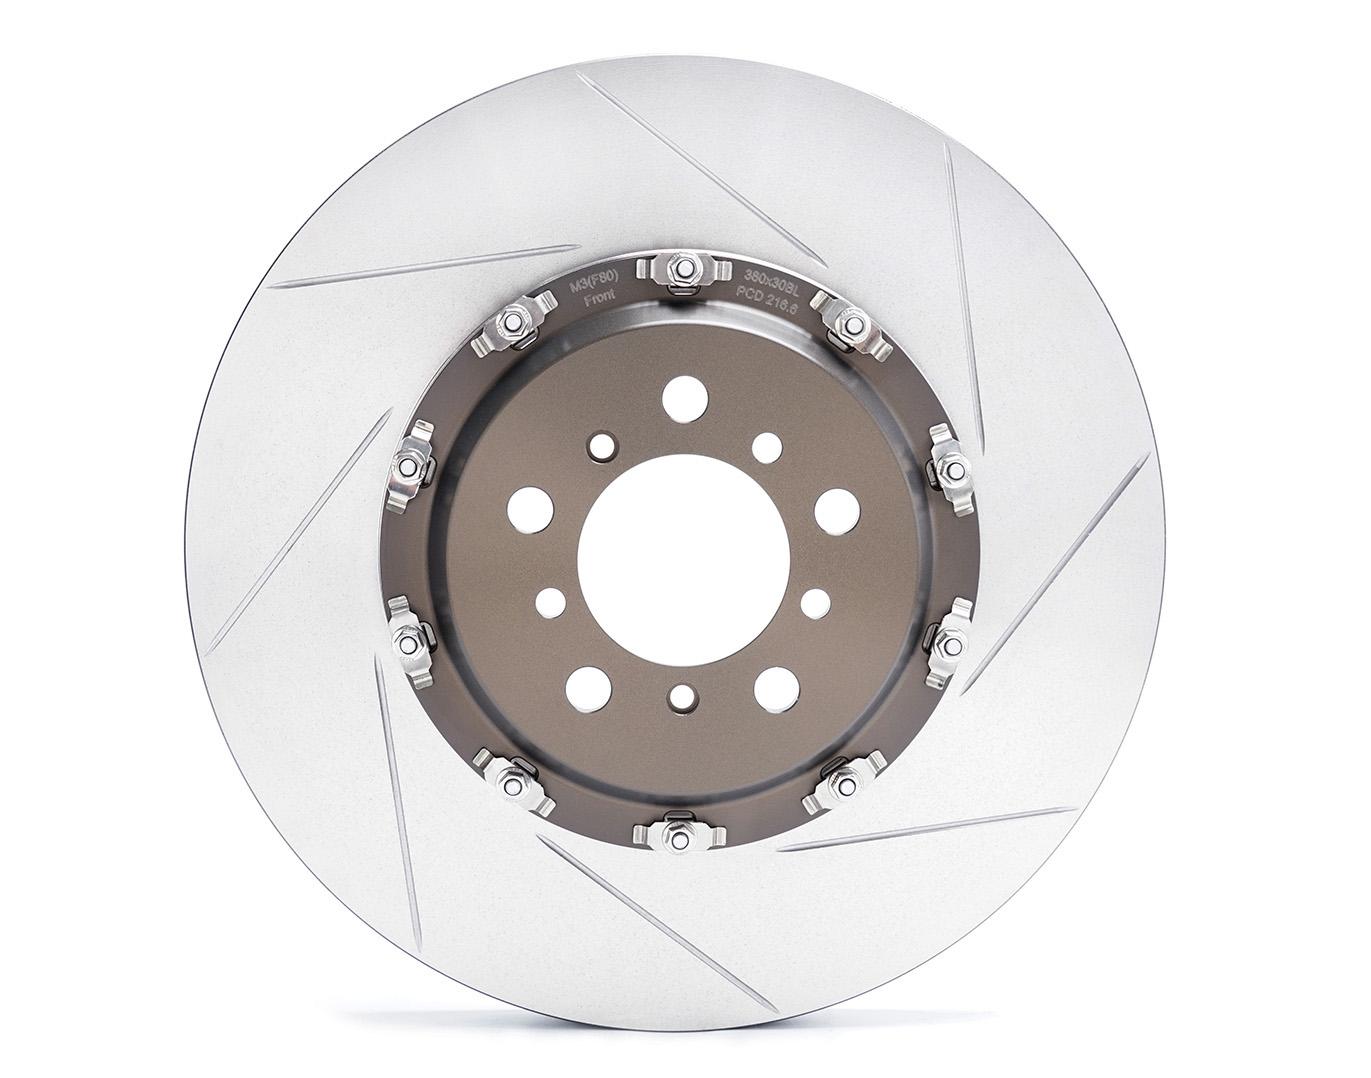 2-piece-brake-rotor-0-1-25p-dt.jpg